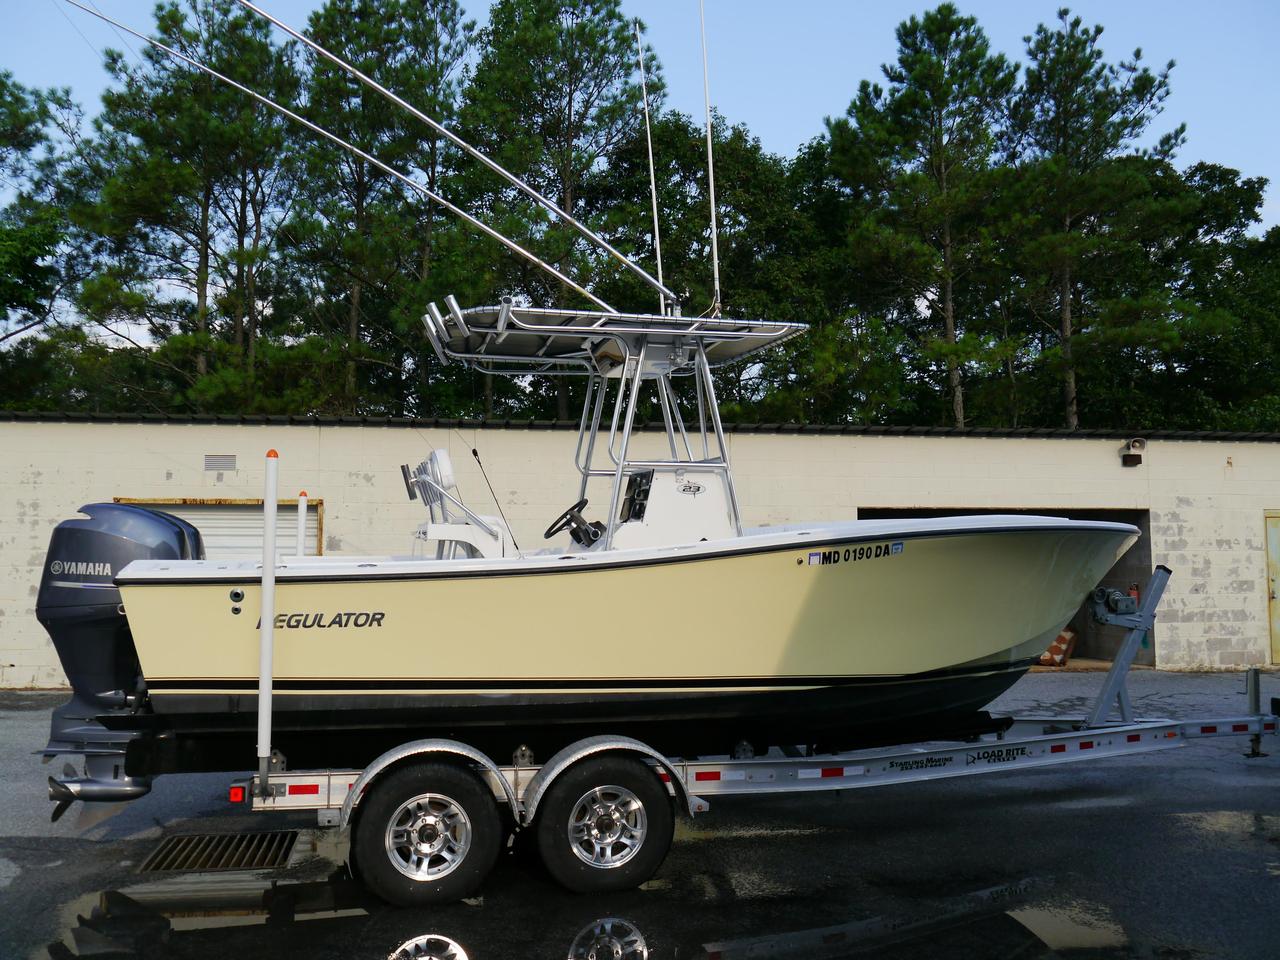 2001 Used Regulator 23 Classic Center Console Fishing Boat